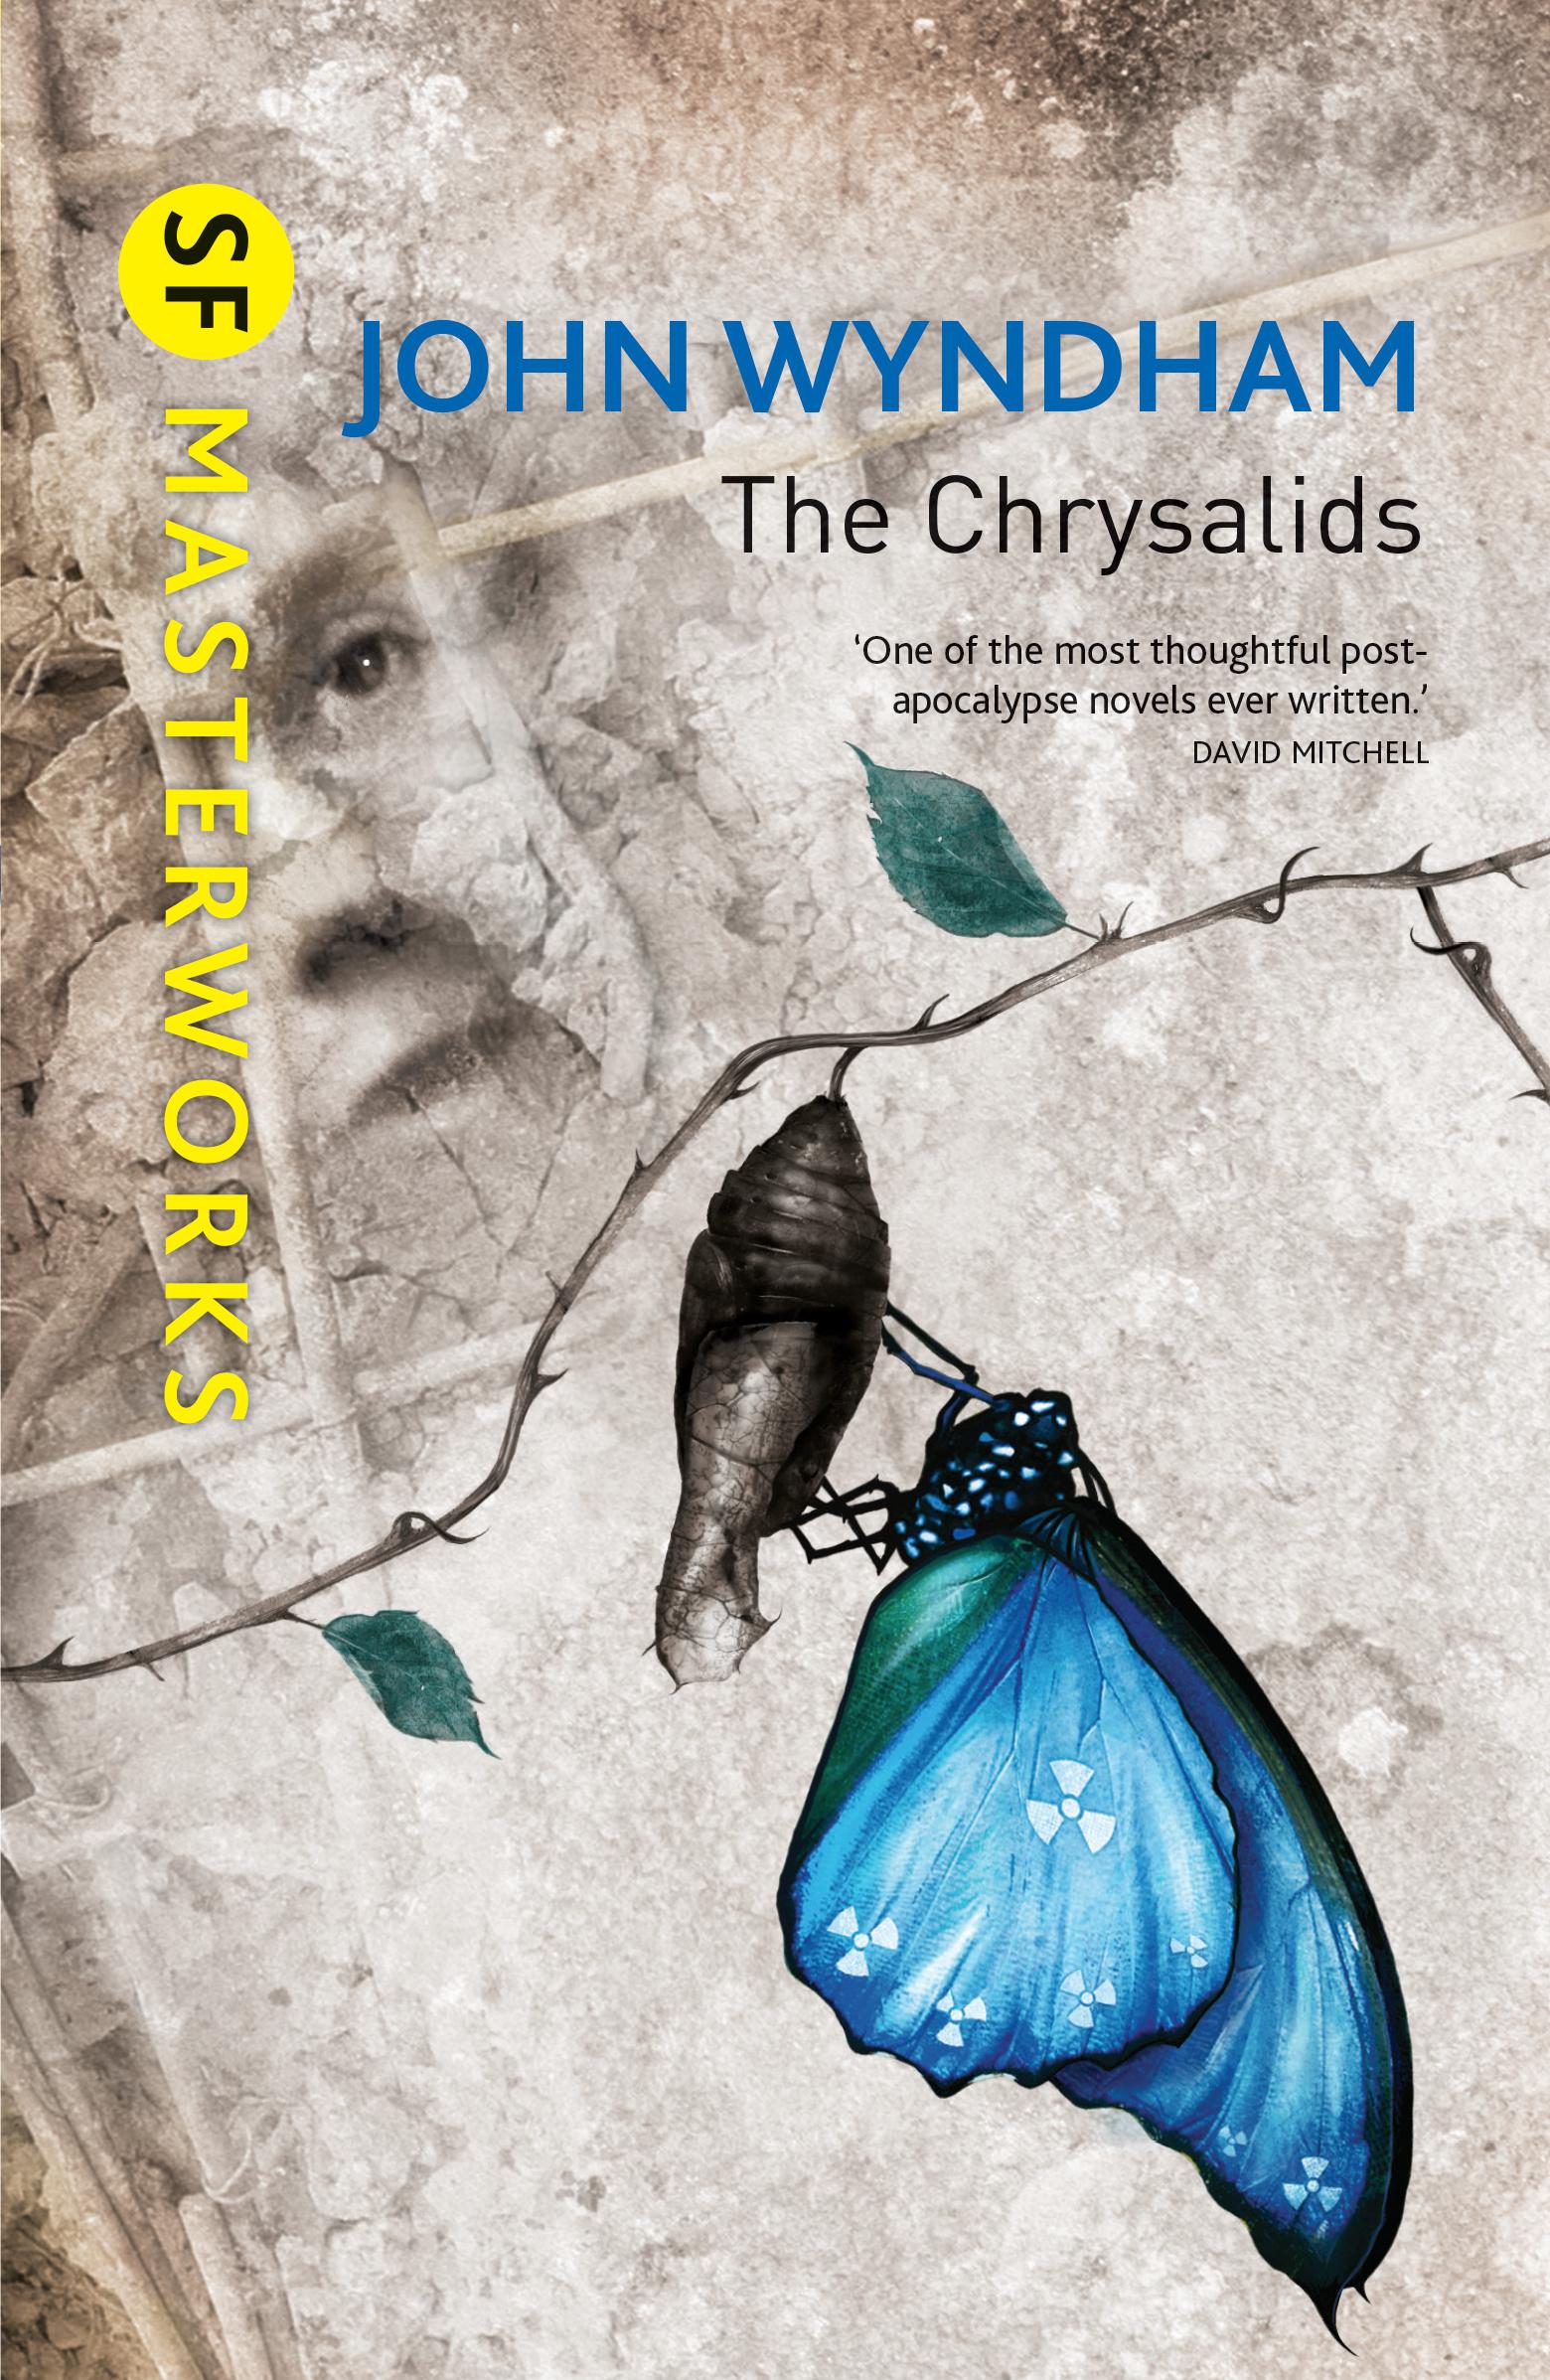 analysis of the chrysalids a sci fi novel written by john wyndham